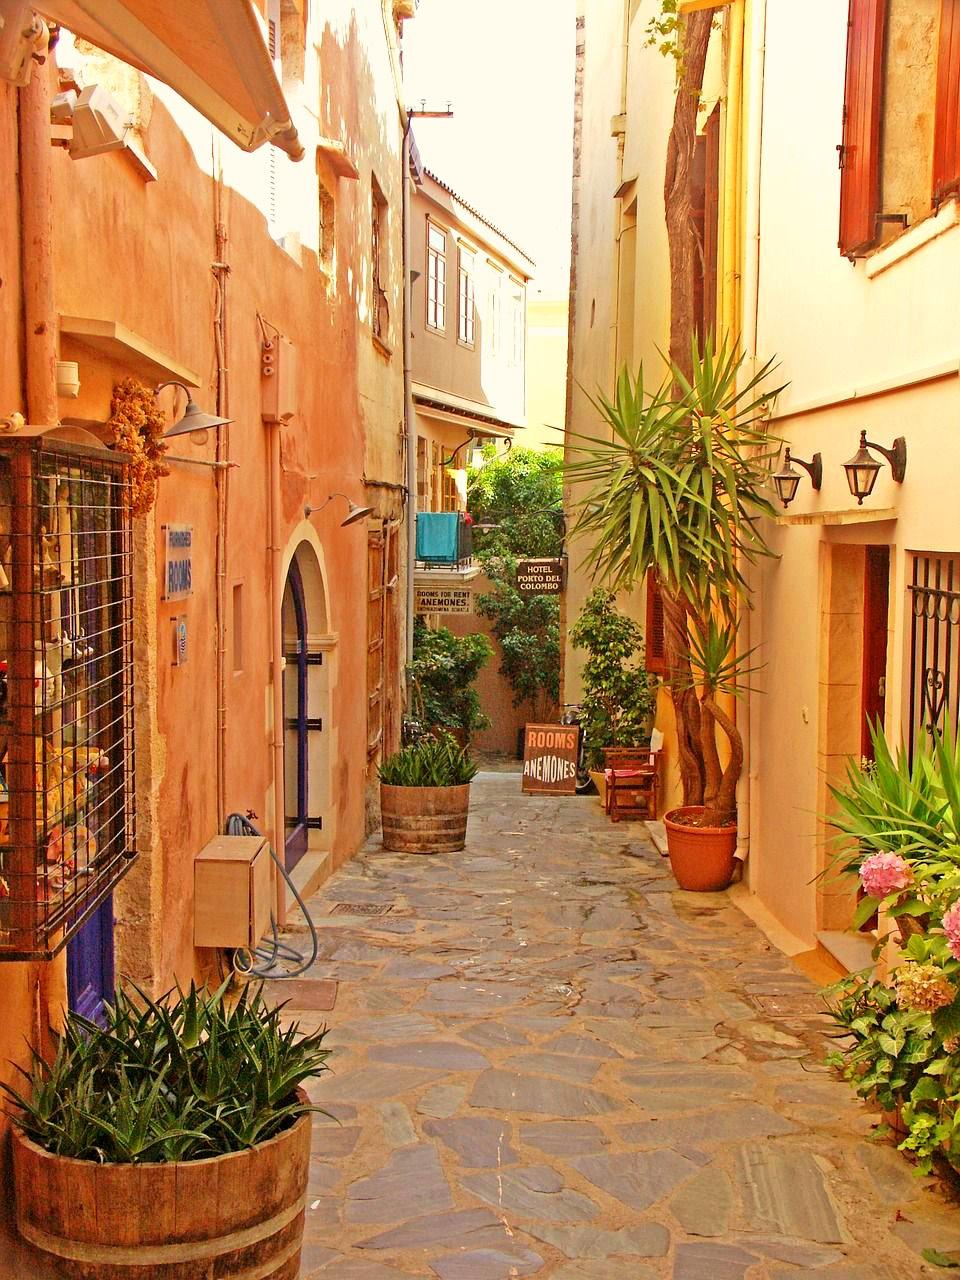 Old street in Crete